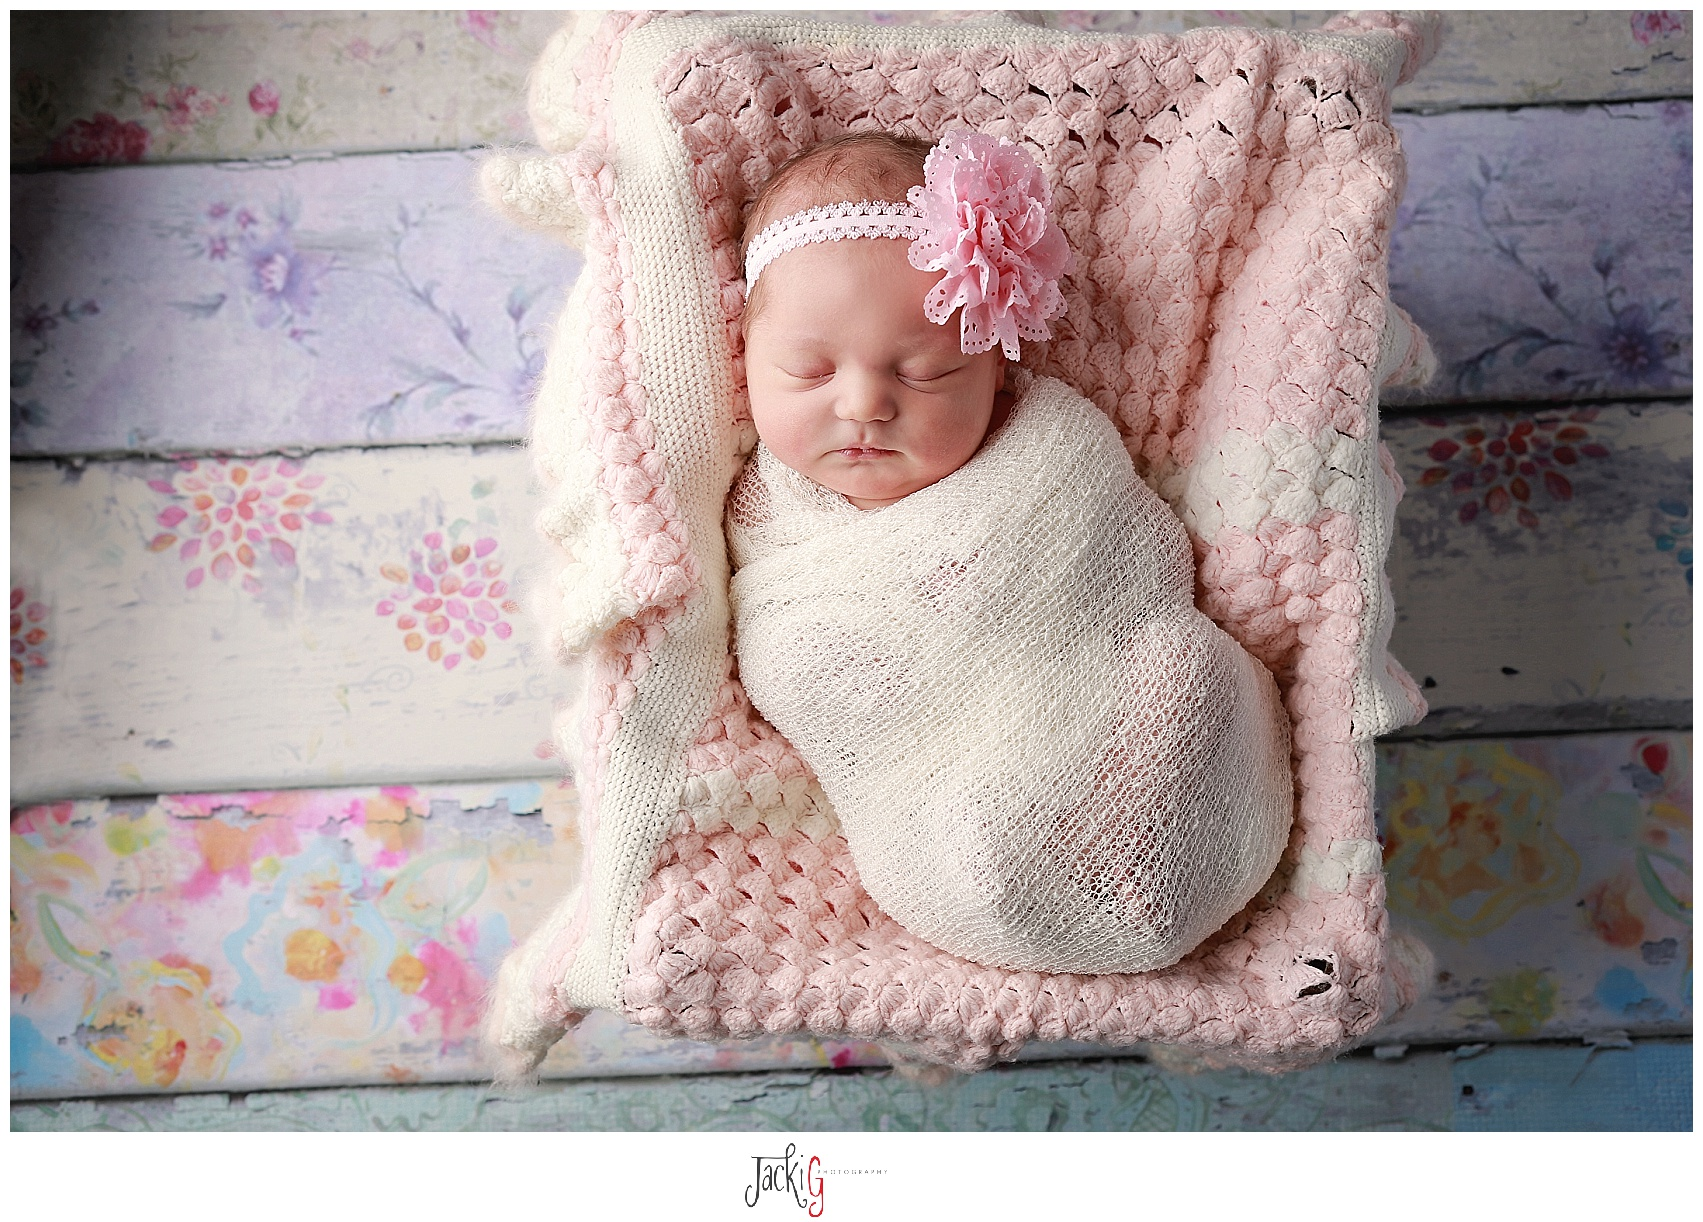 #newbornphotography # Jacki G Photography